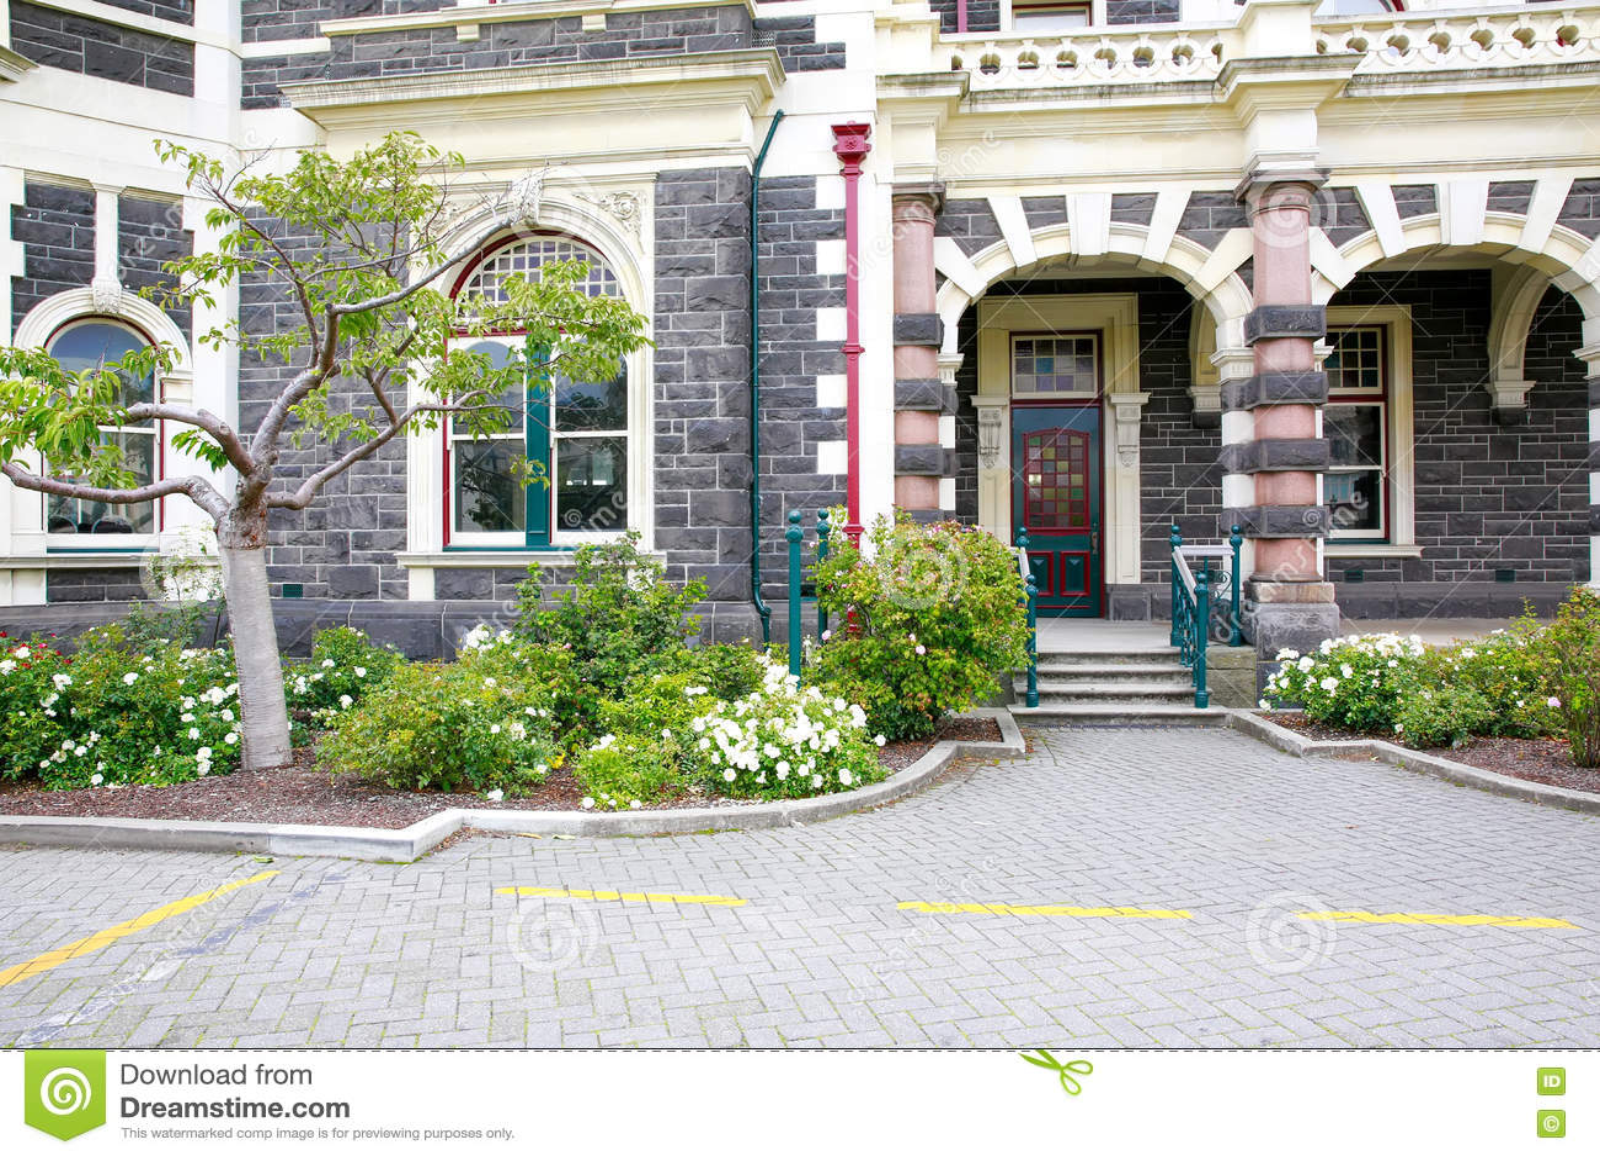 DUNEDIN, NOUVELLE-ZÉLANDE - FEBR 10, 2015 : entrée de gare ferroviaire de Dunedin